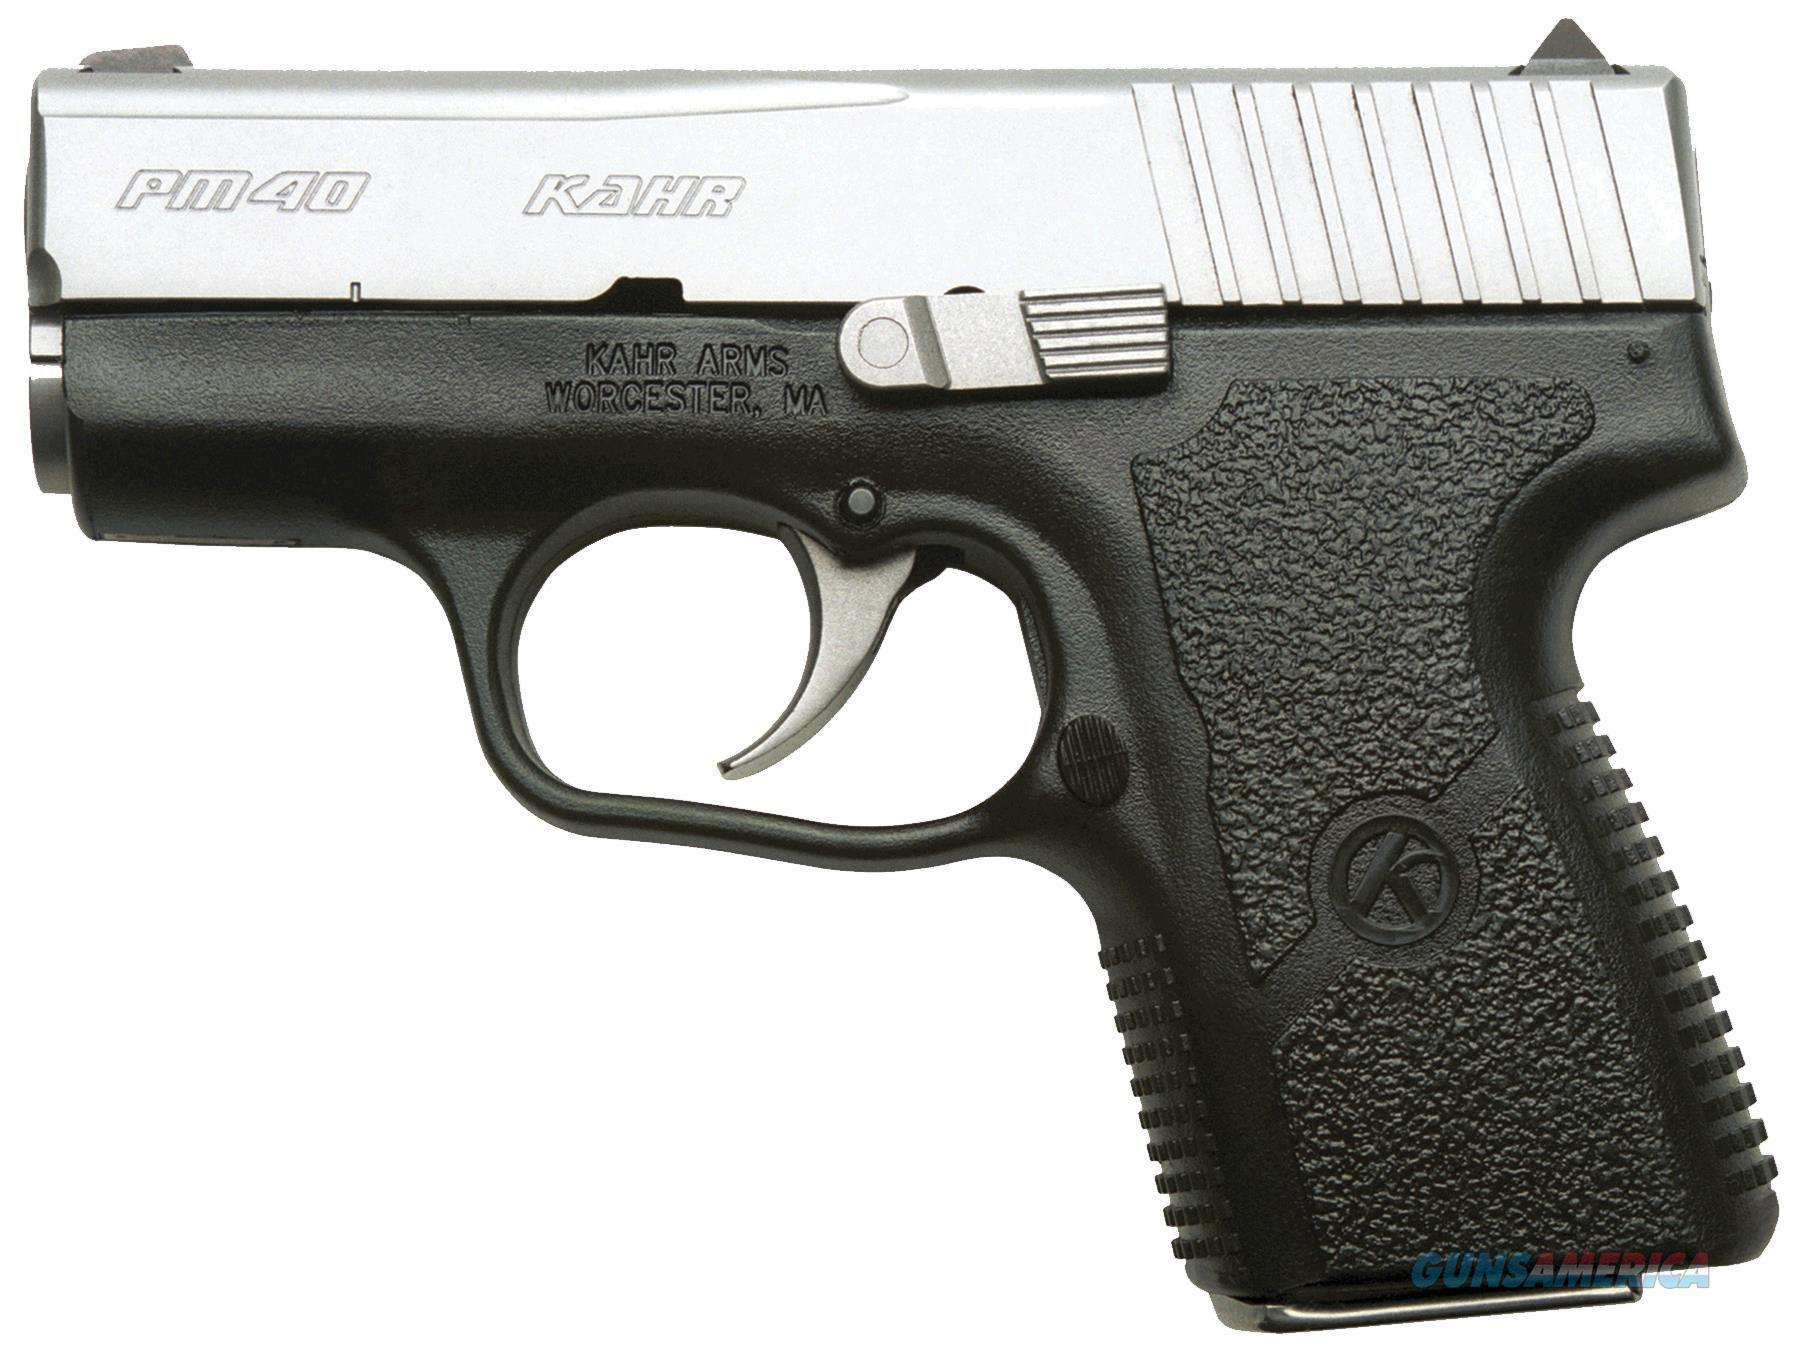 "Kahr Arms Pm4043n Pm40 Standard 40S&W 3"" 5+1/6+1 Ns Blk Polymer Grip Mss Slide PM4043N  Guns > Pistols > K Misc Pistols"